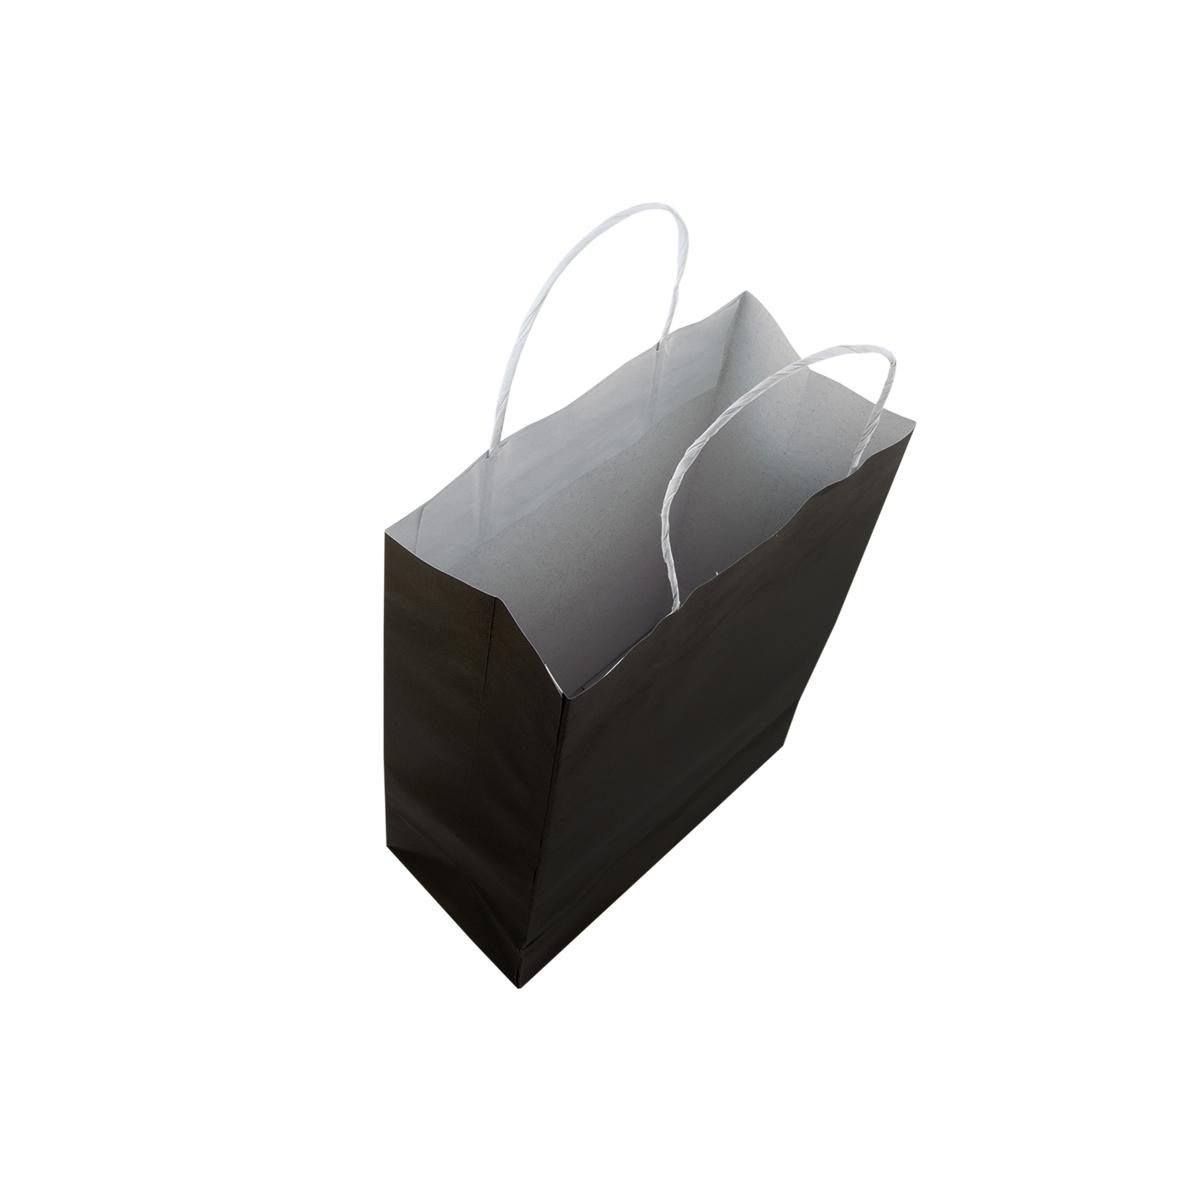 Kit 200 Sacolas Papel Preta Pequena 26x18x9